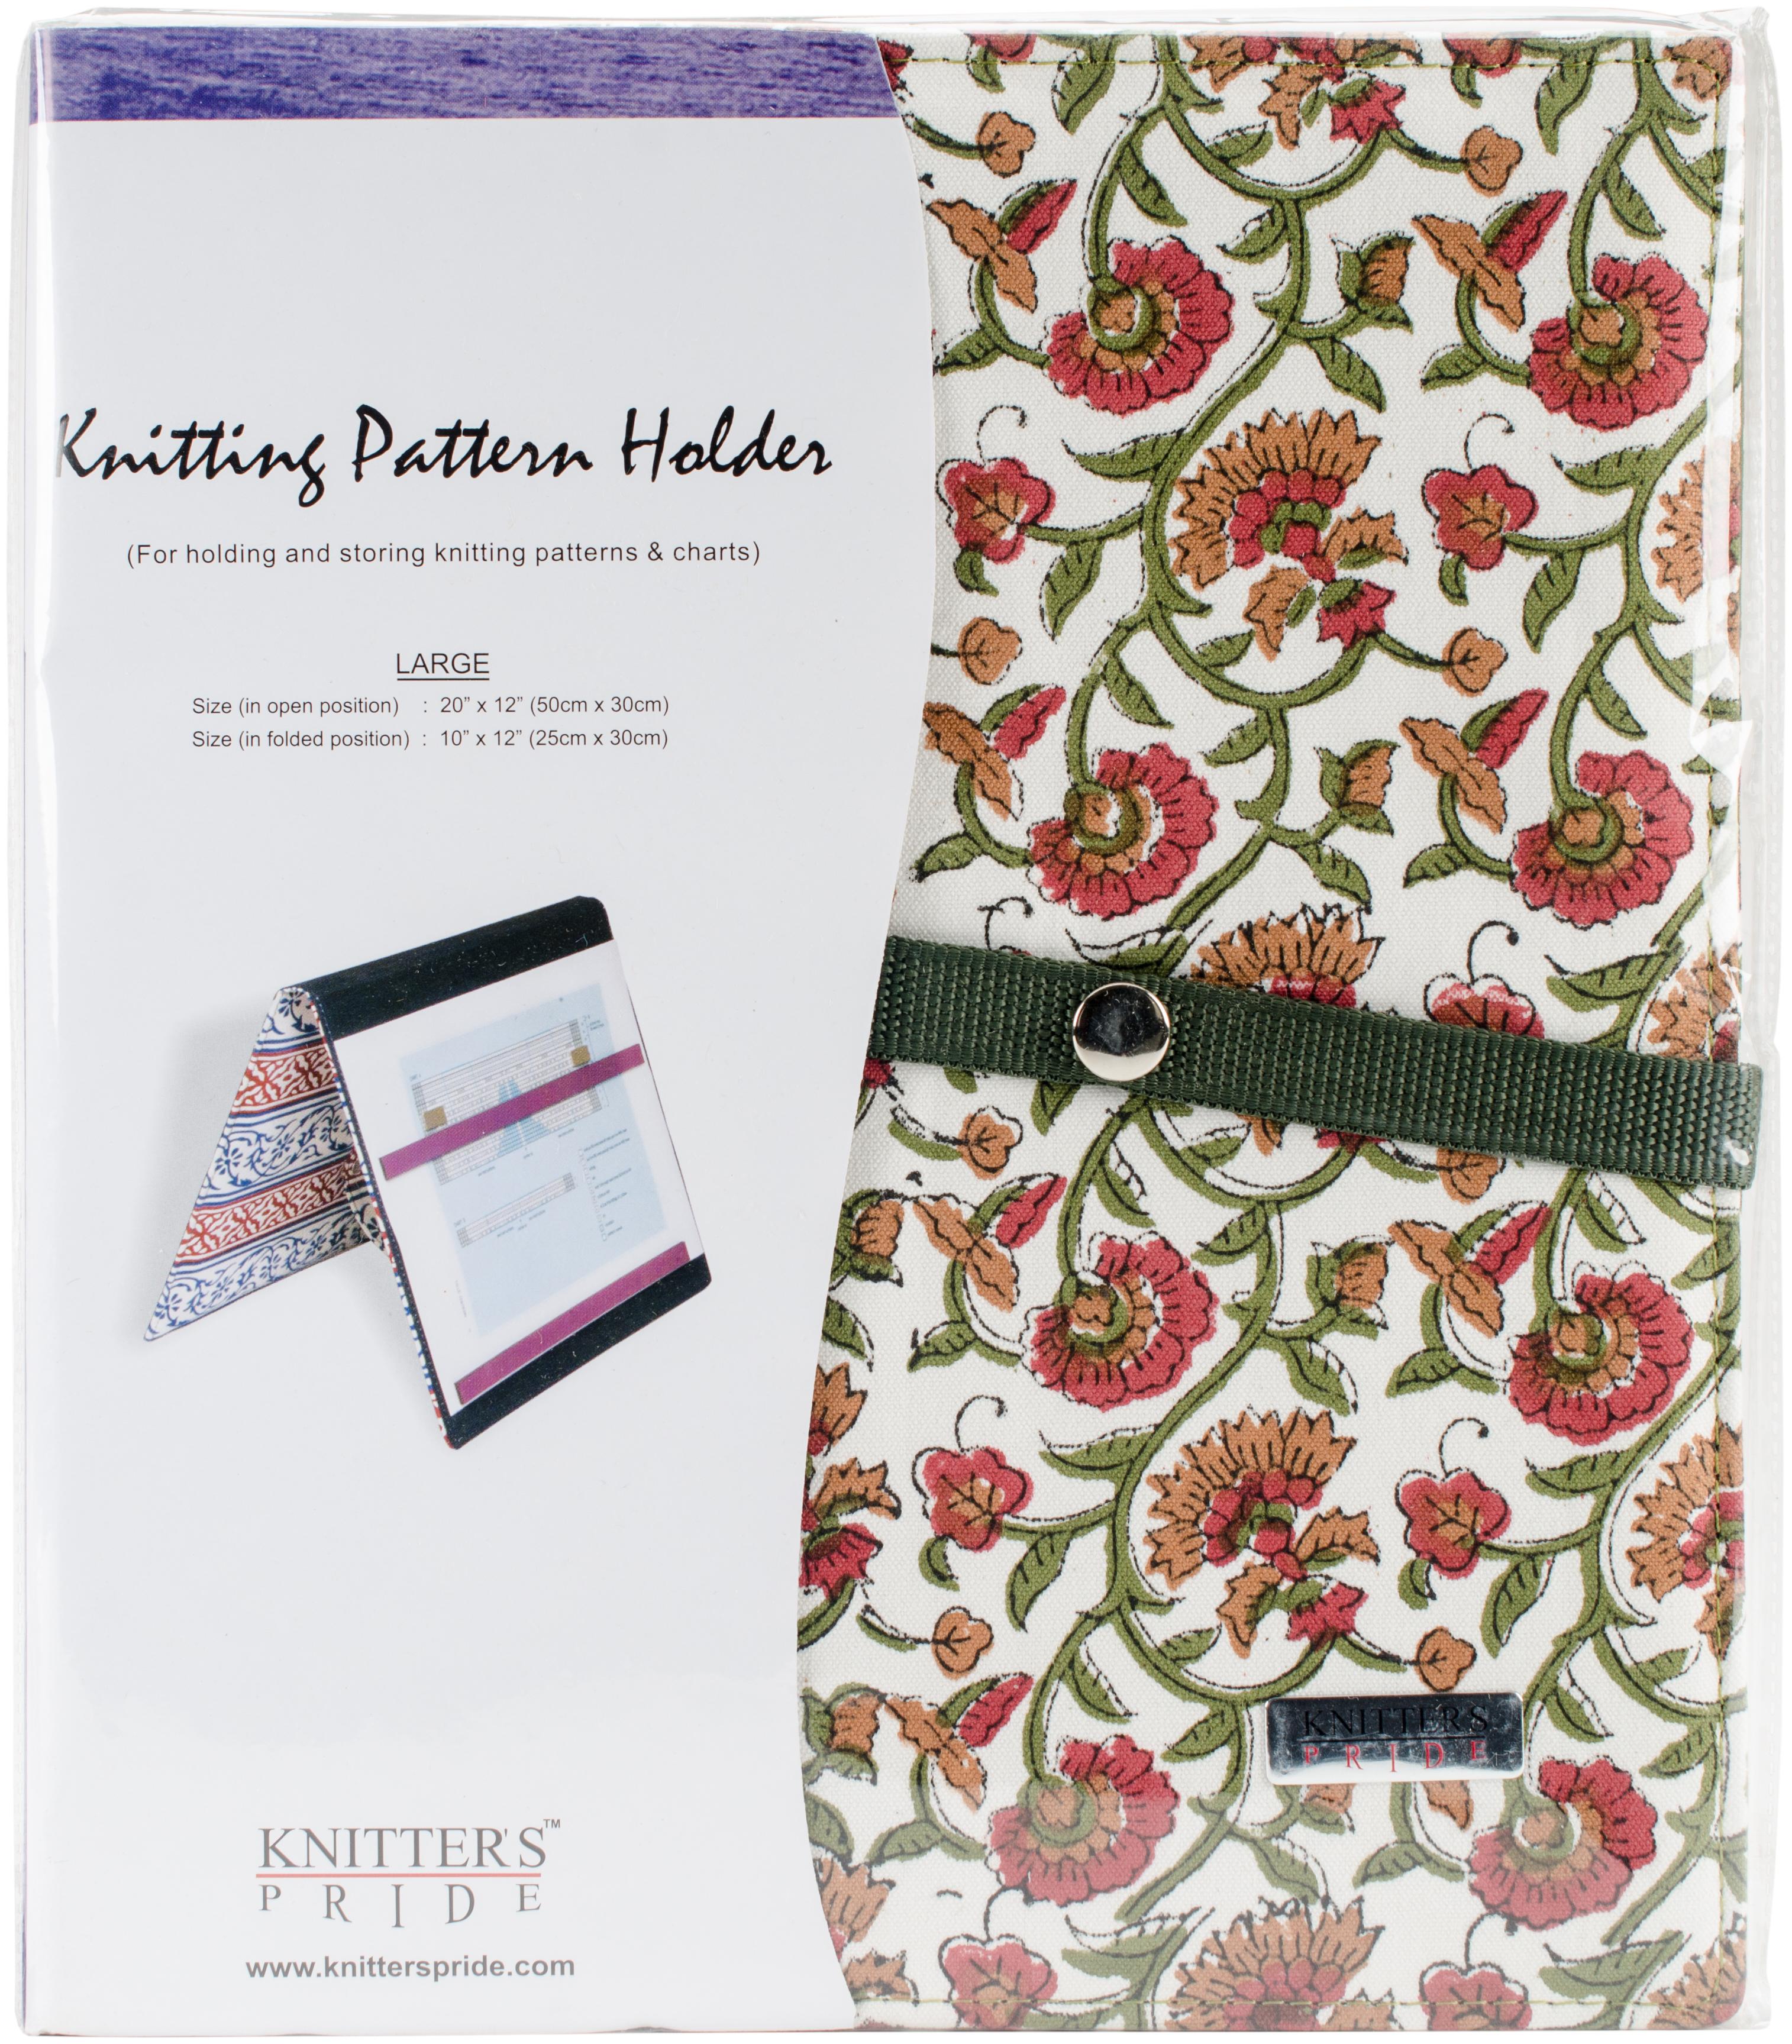 Knitter's Pride Pattern Holder Large - Aspire